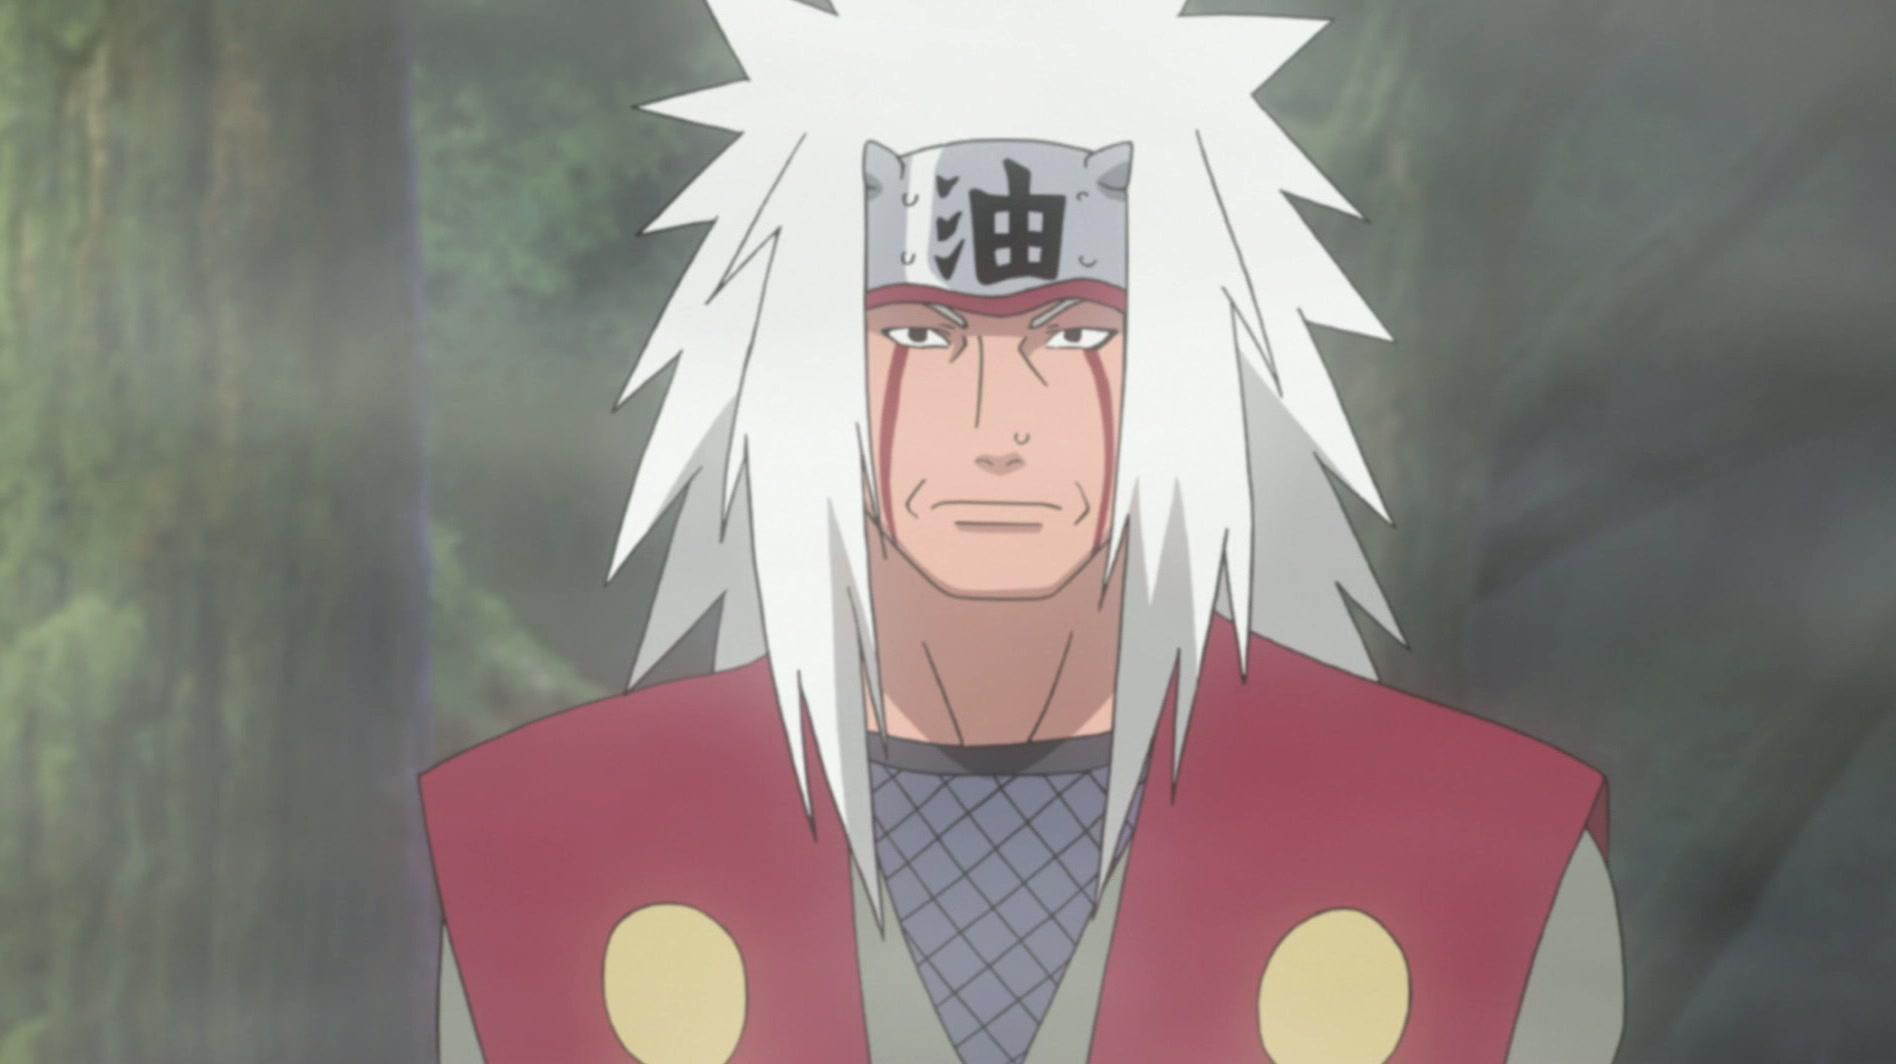 Naruto Shippuden: The Past: The Hidden Leaf Village Episode 188